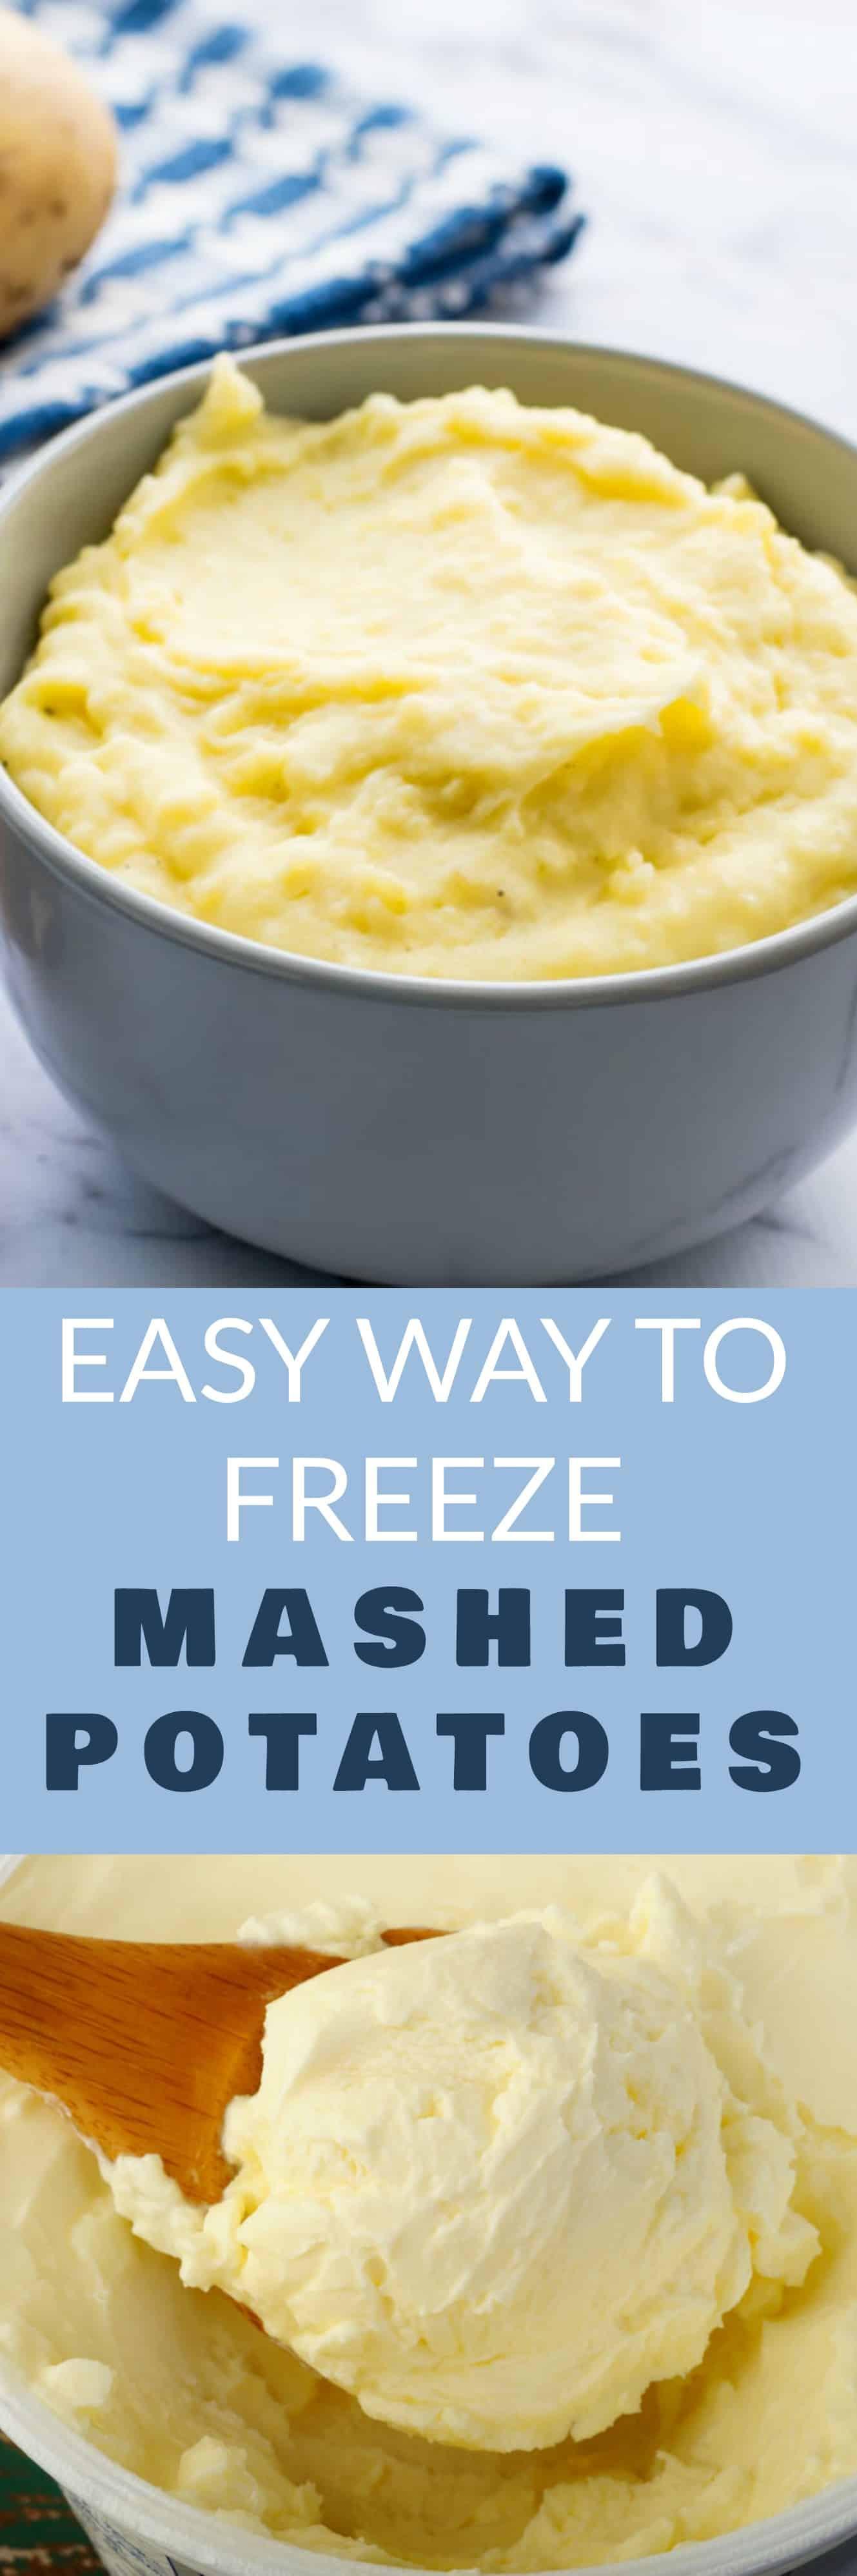 Can I Freeze Mashed Potatoes  Easy Way to Freeze Mashed Potatoes Brooklyn Farm Girl